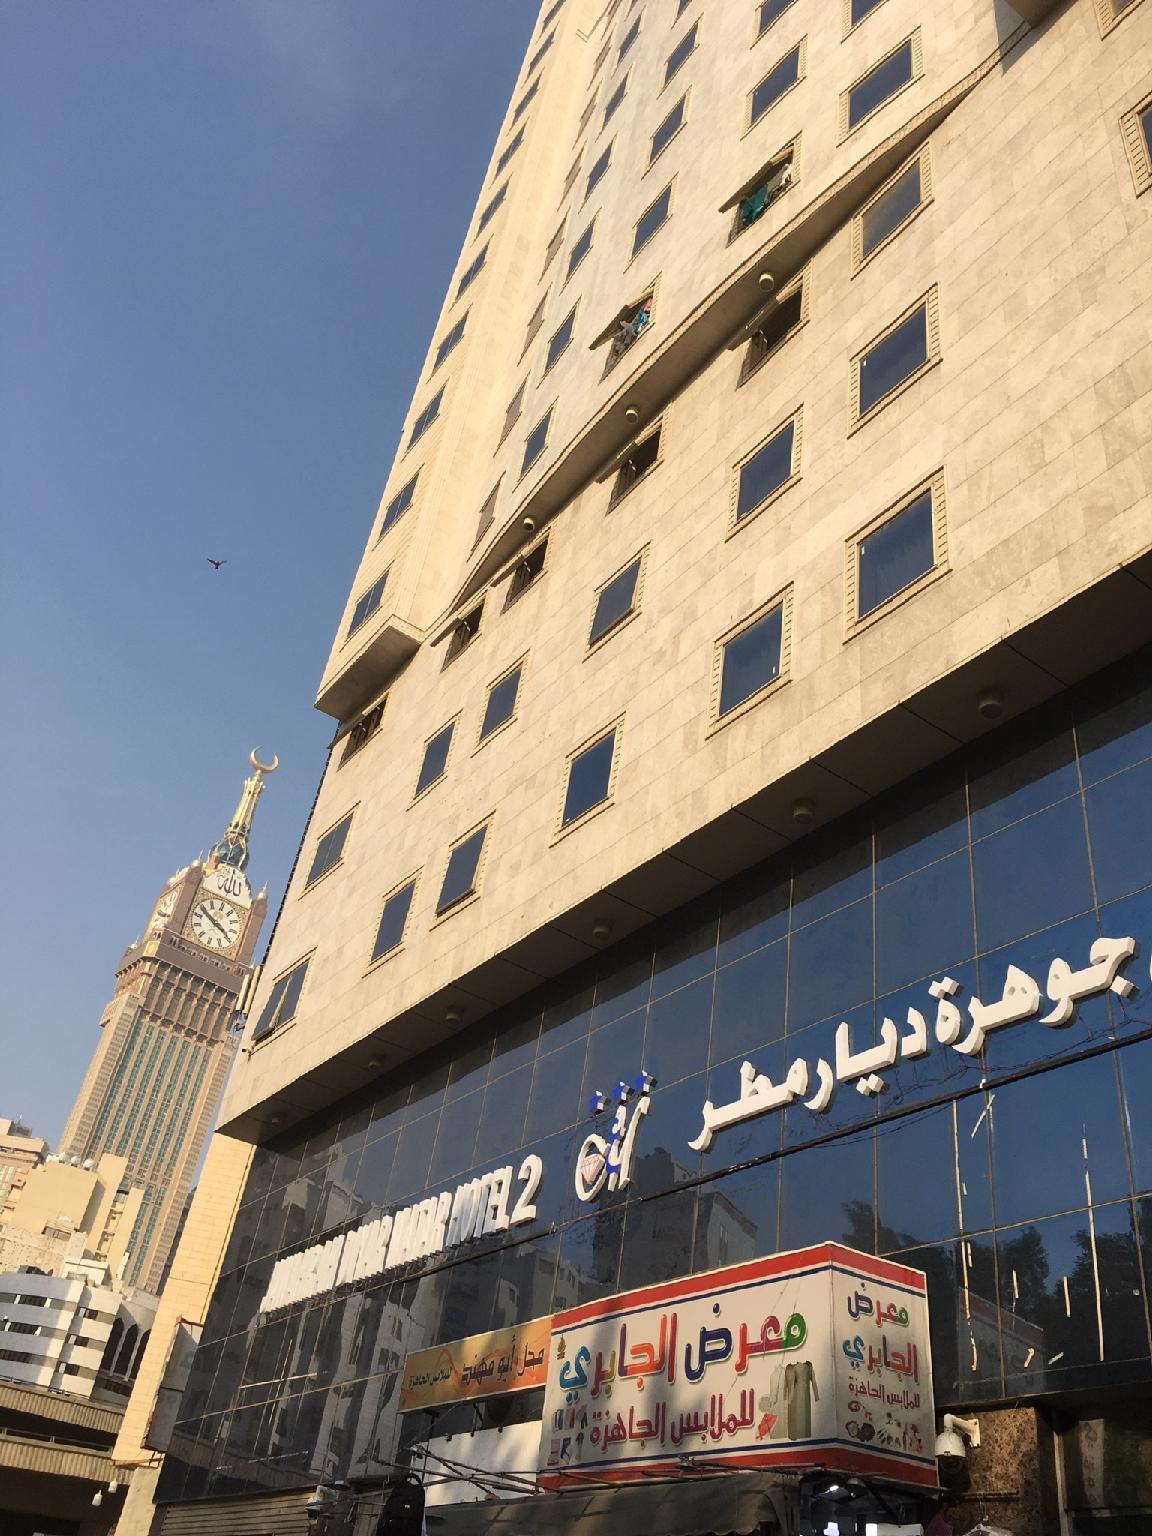 Jawharah Diyar Matar 2 Hotel